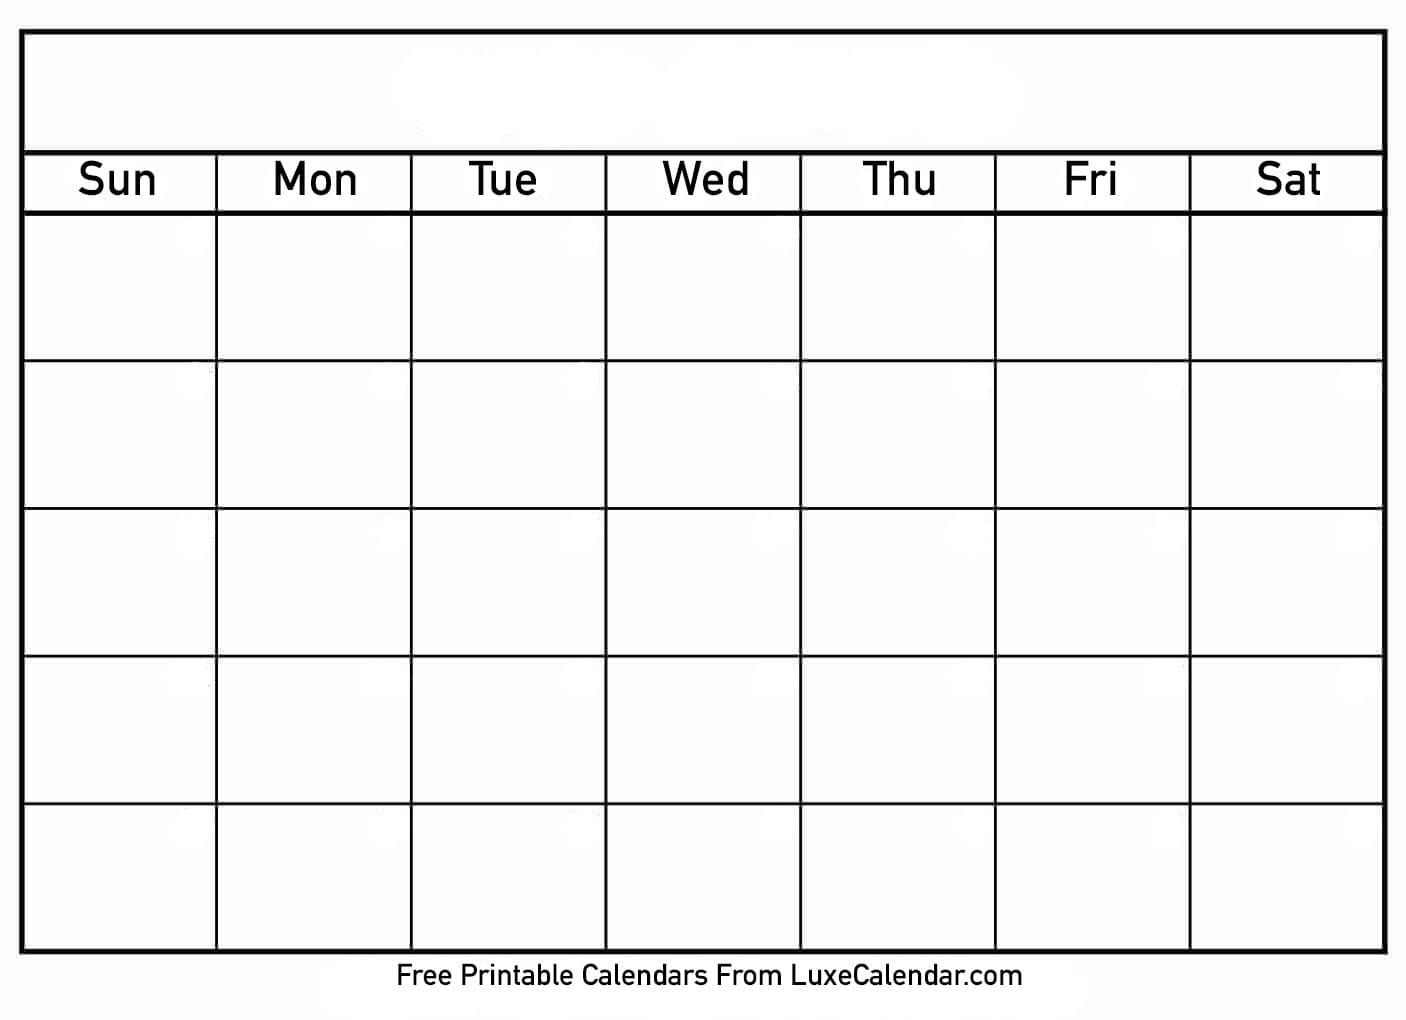 Blank Printable Calendar - Luxe Calendar within Blank Calendar Template With Lines